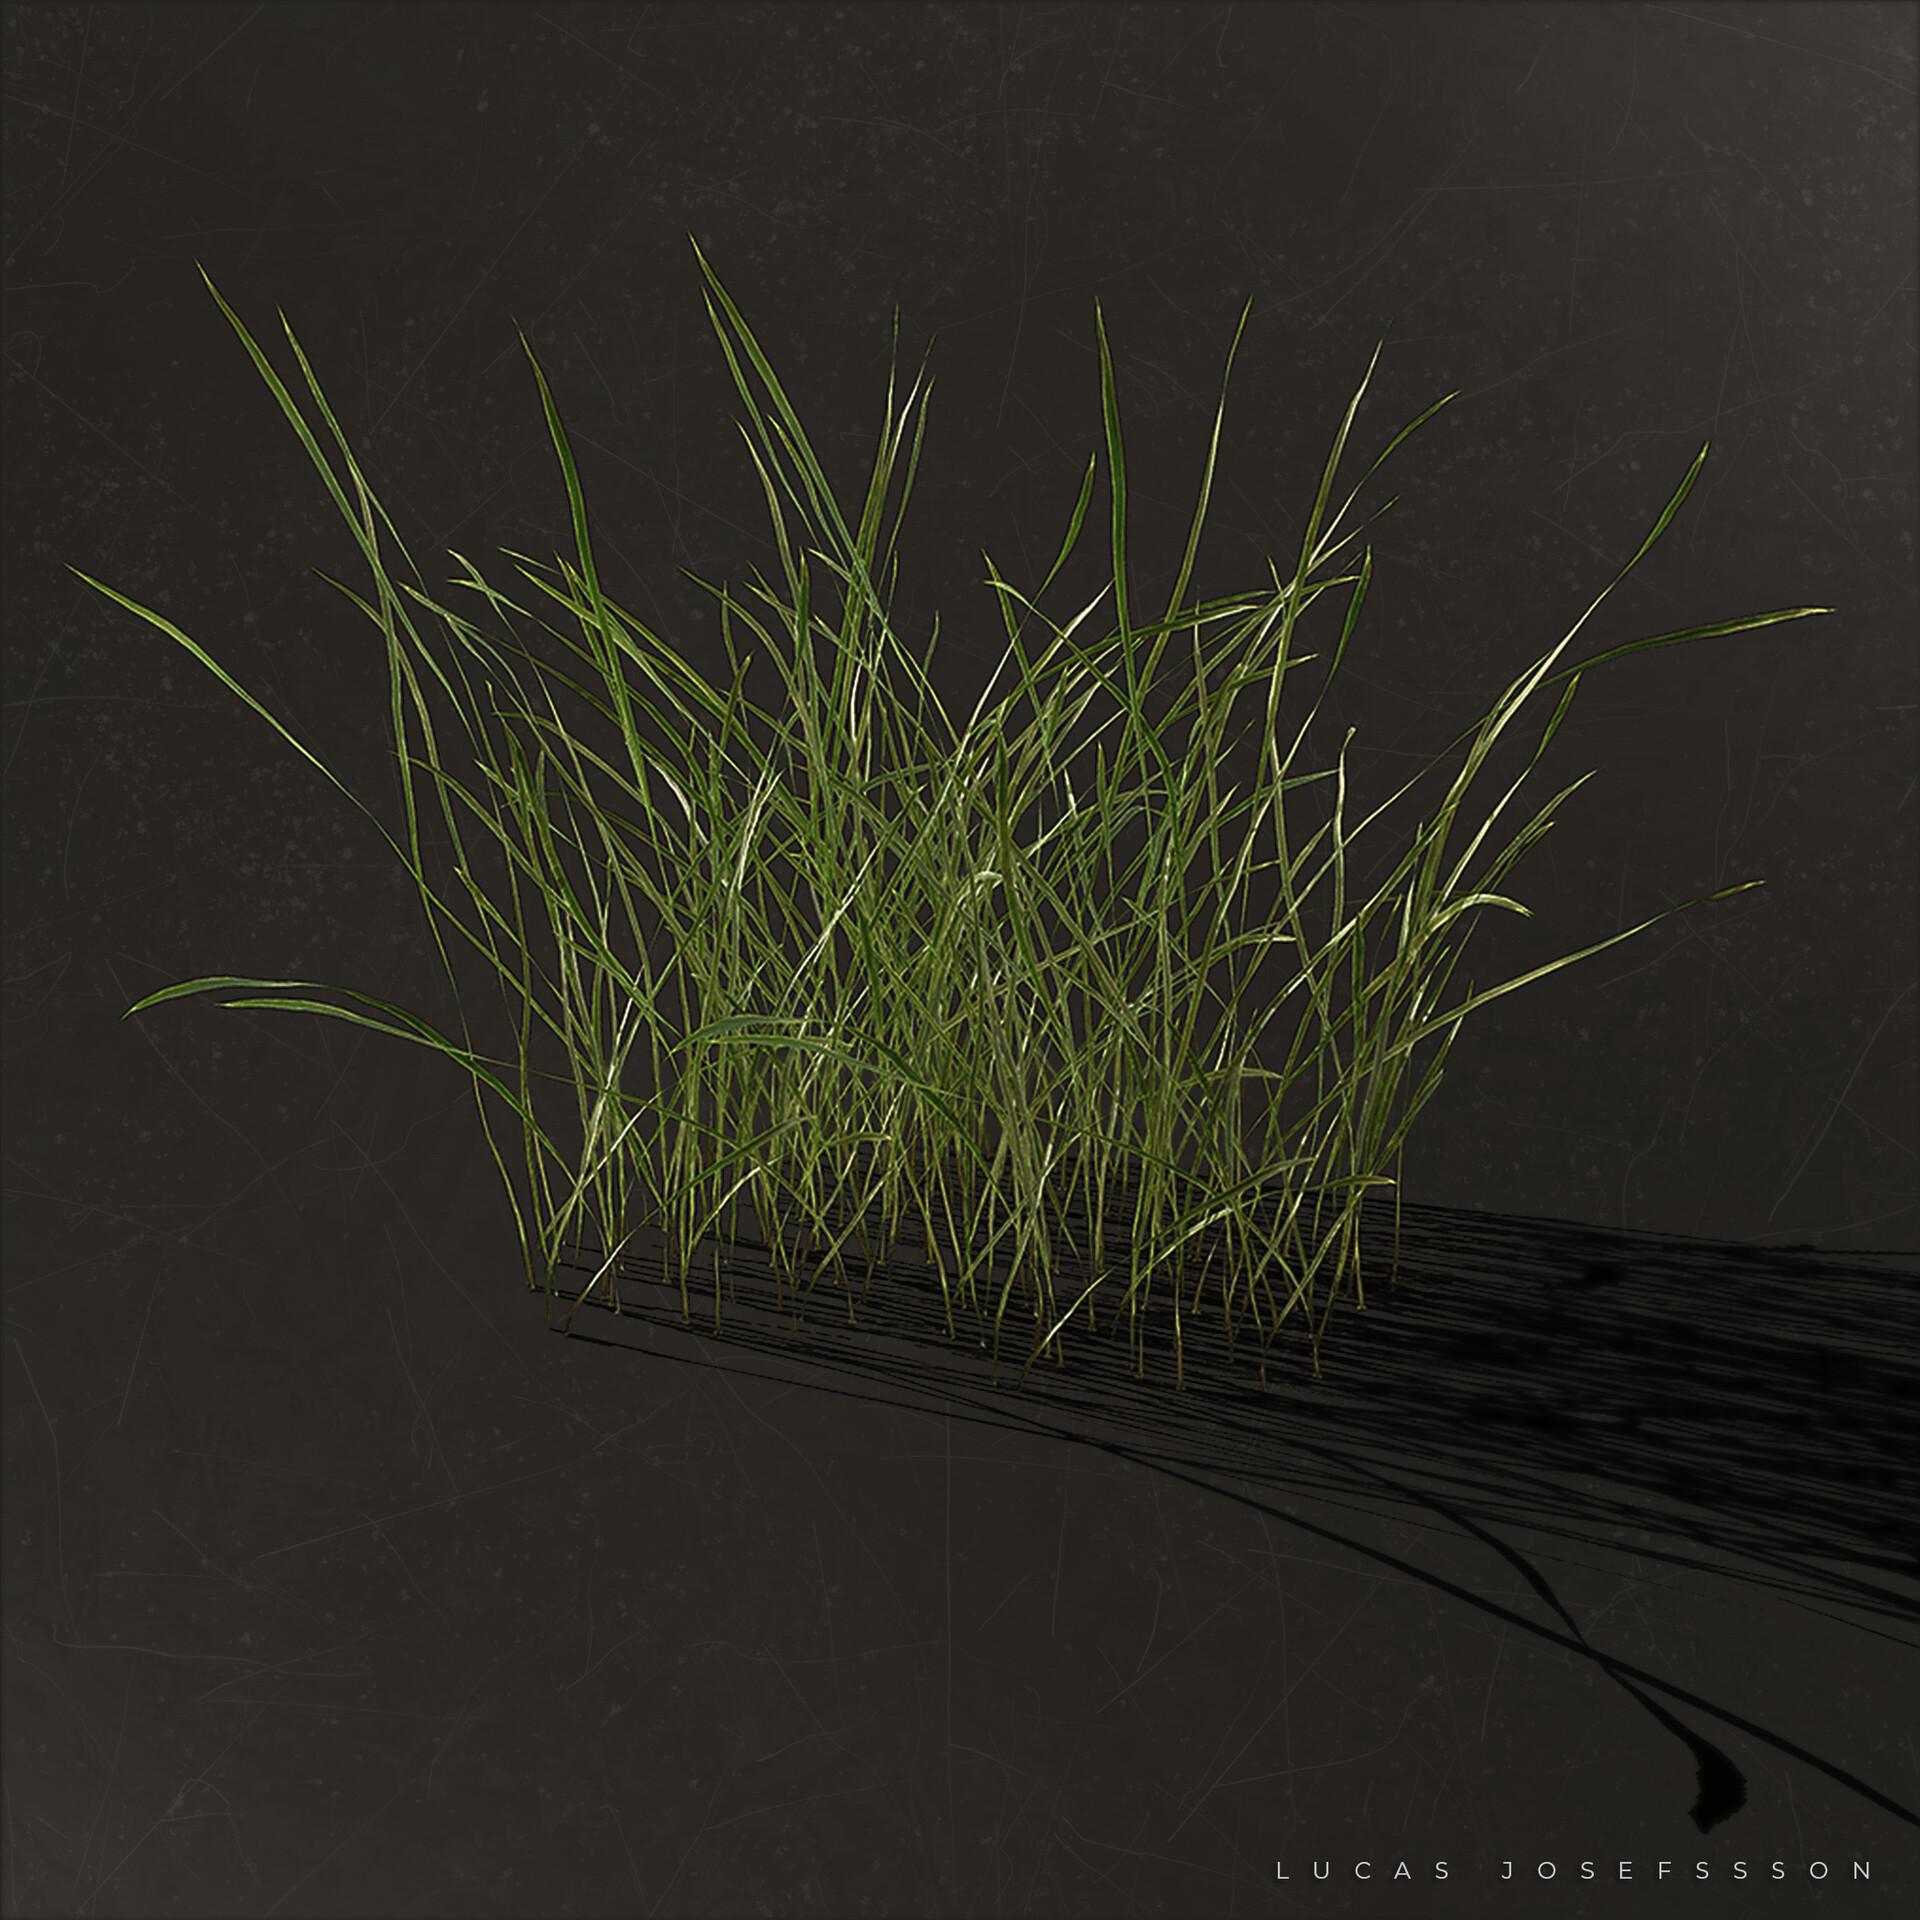 Marmoset grass render